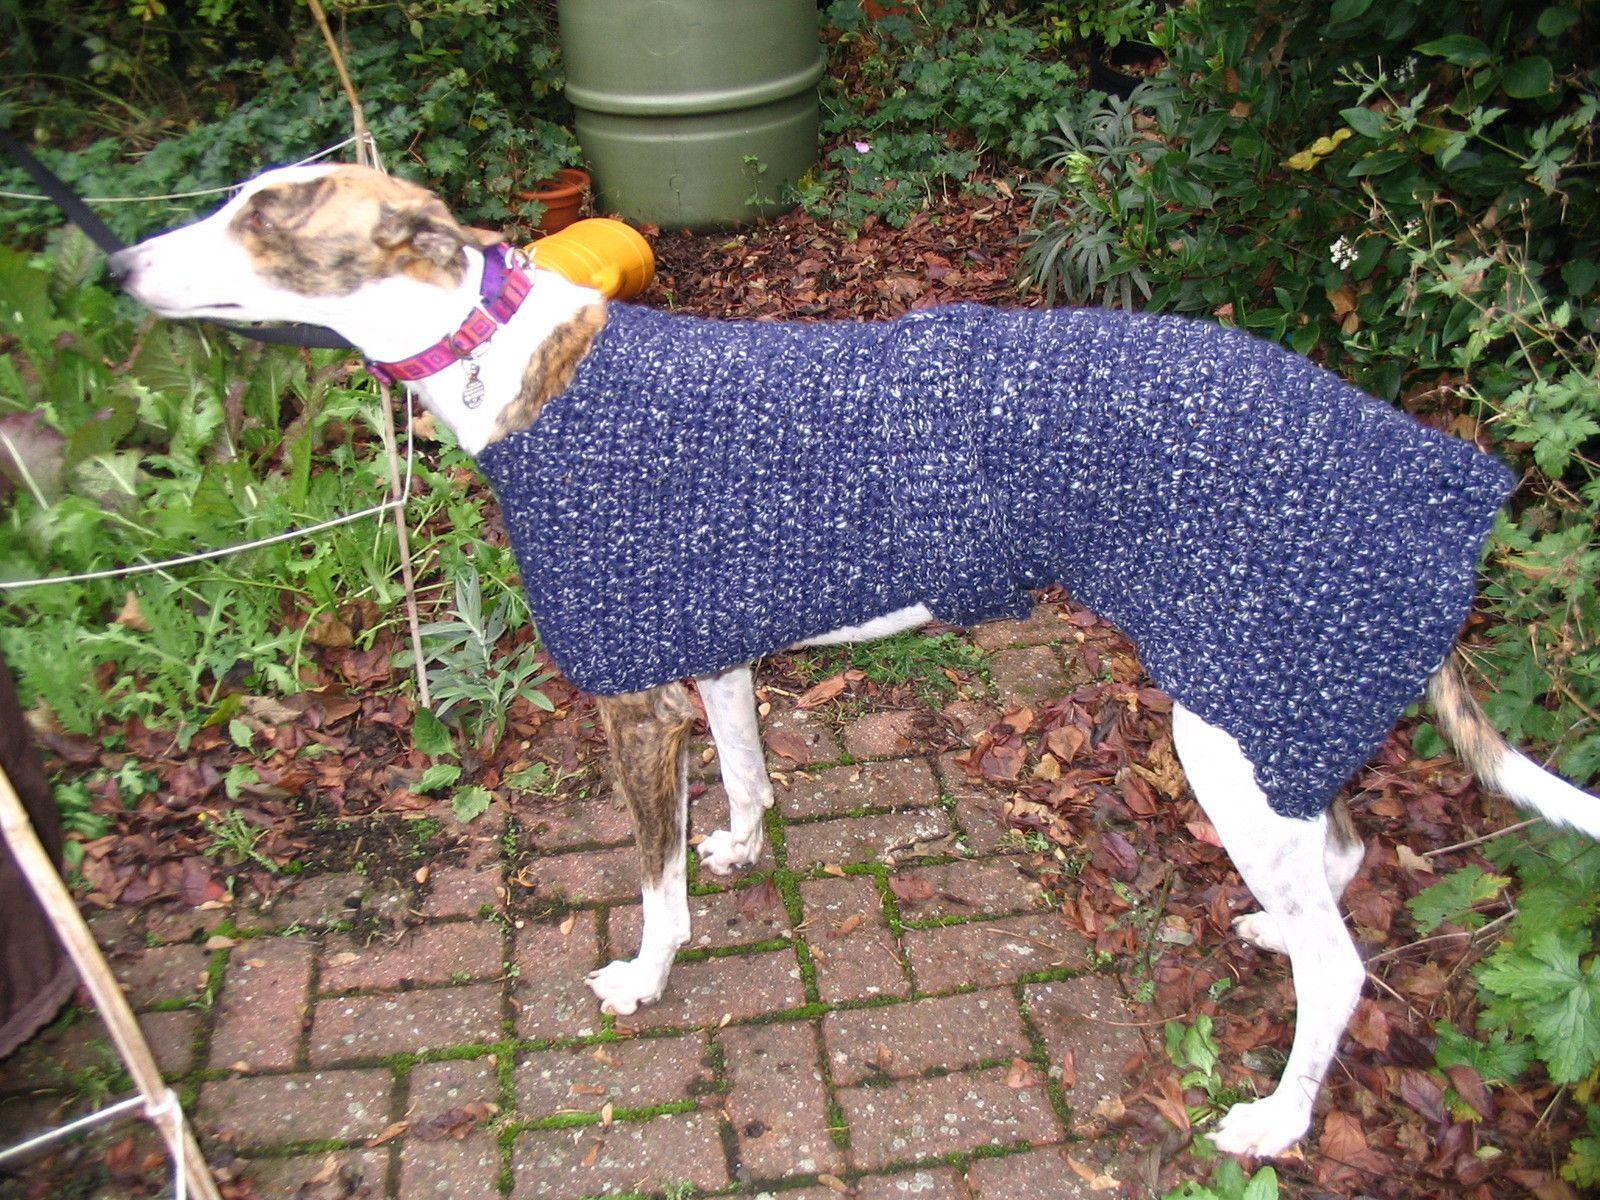 Crocheted greyhound coat crochet crochet hooks and tutorials crocheted greyhound coat bankloansurffo Gallery